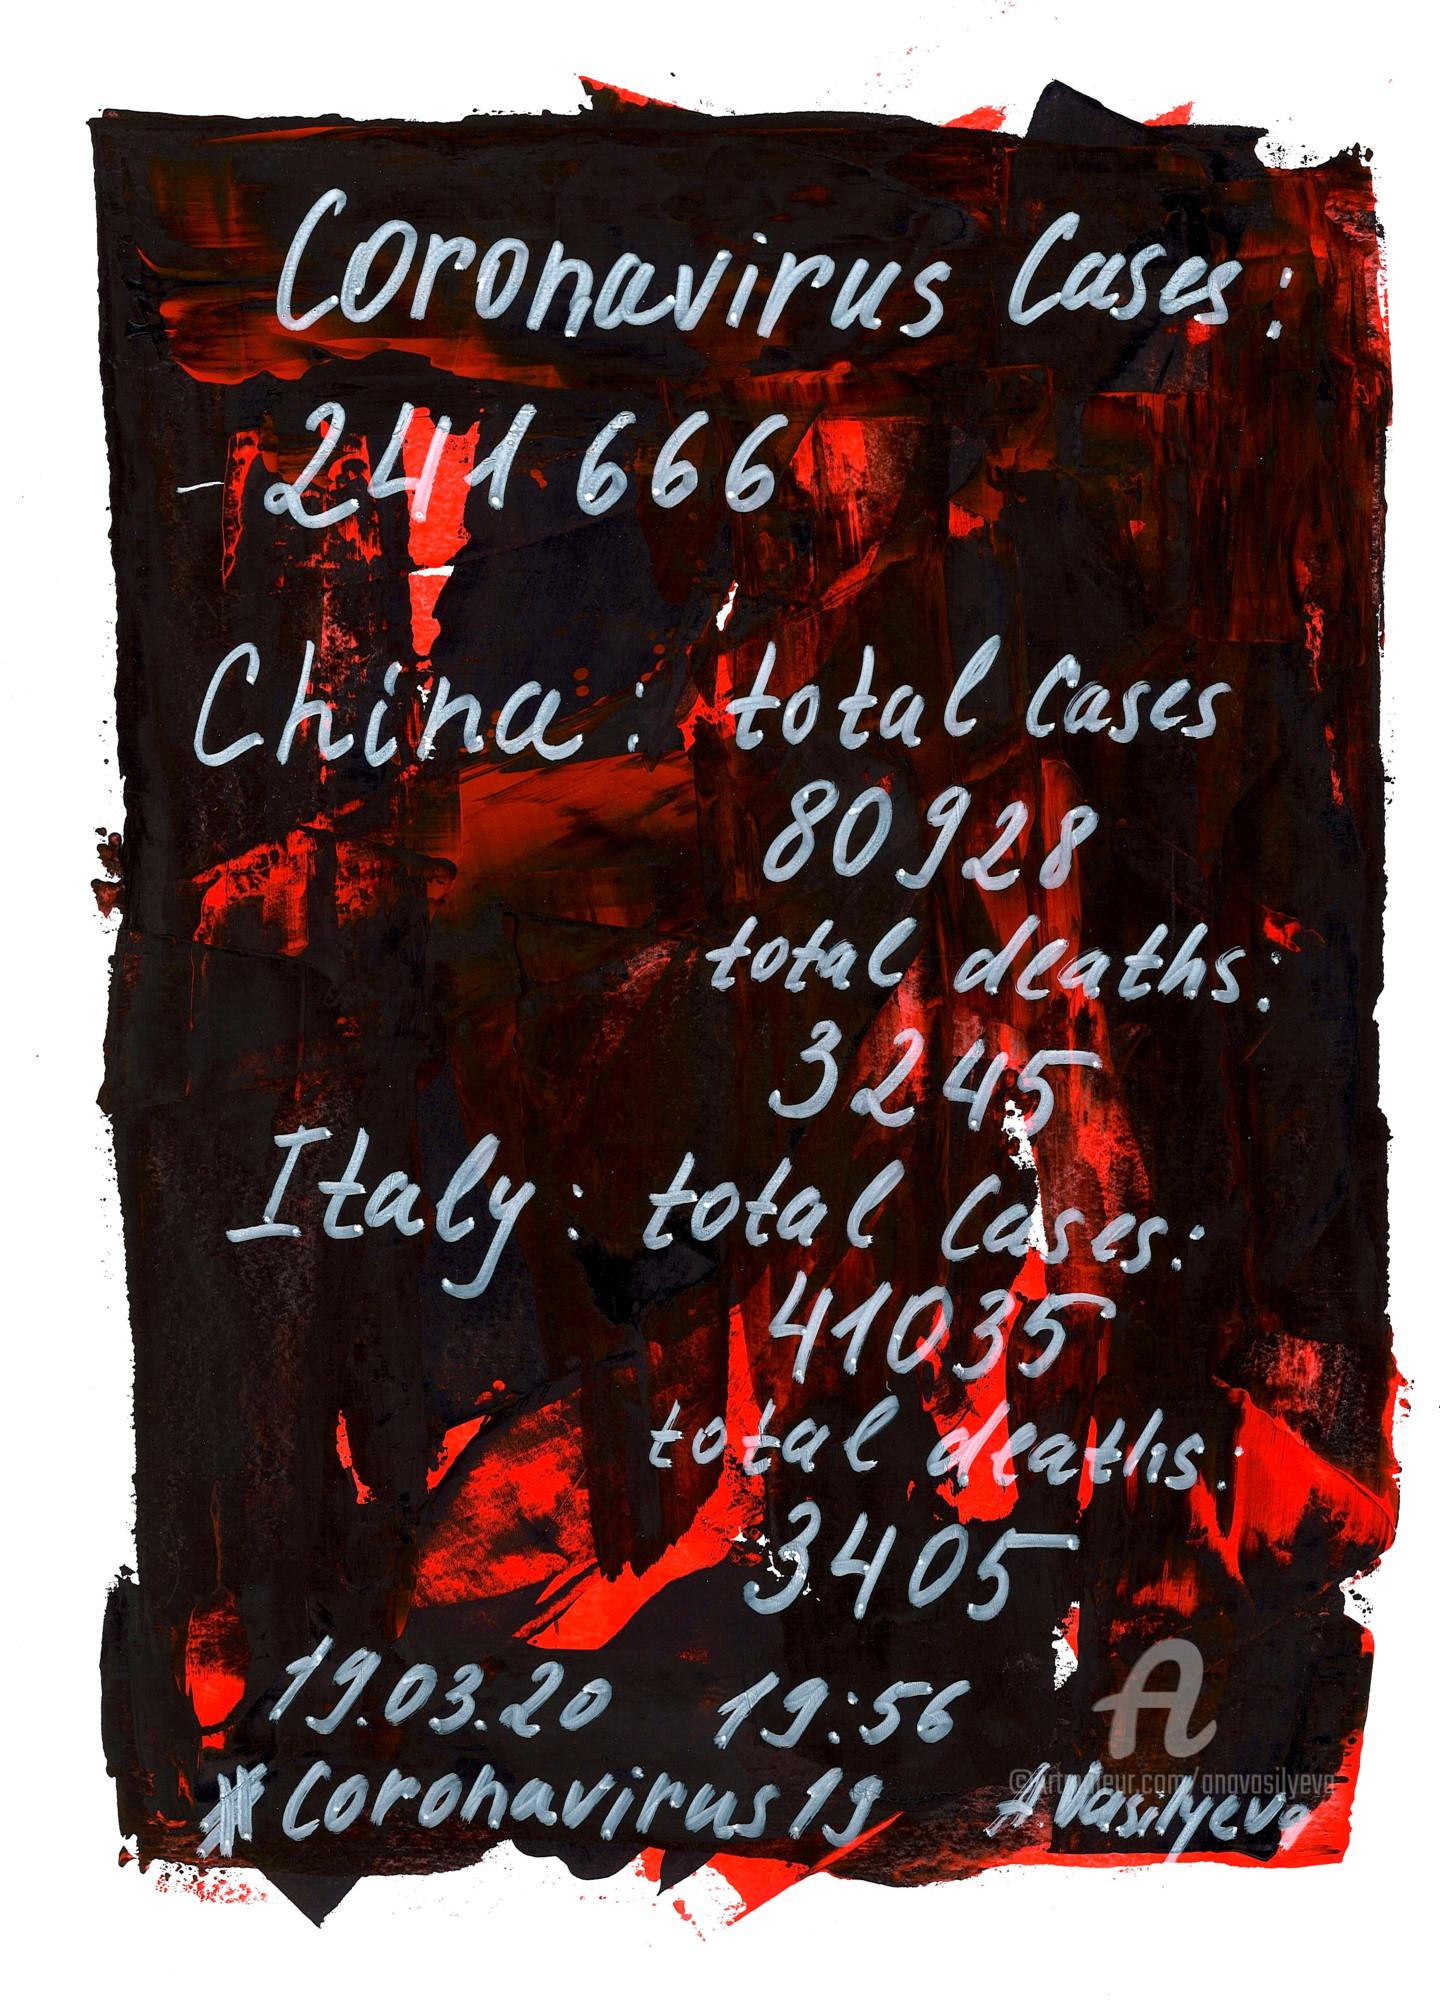 Anastasia Vasilyeva - 19.03.2020 - Terrifying statistics. From COVID-19 Art.